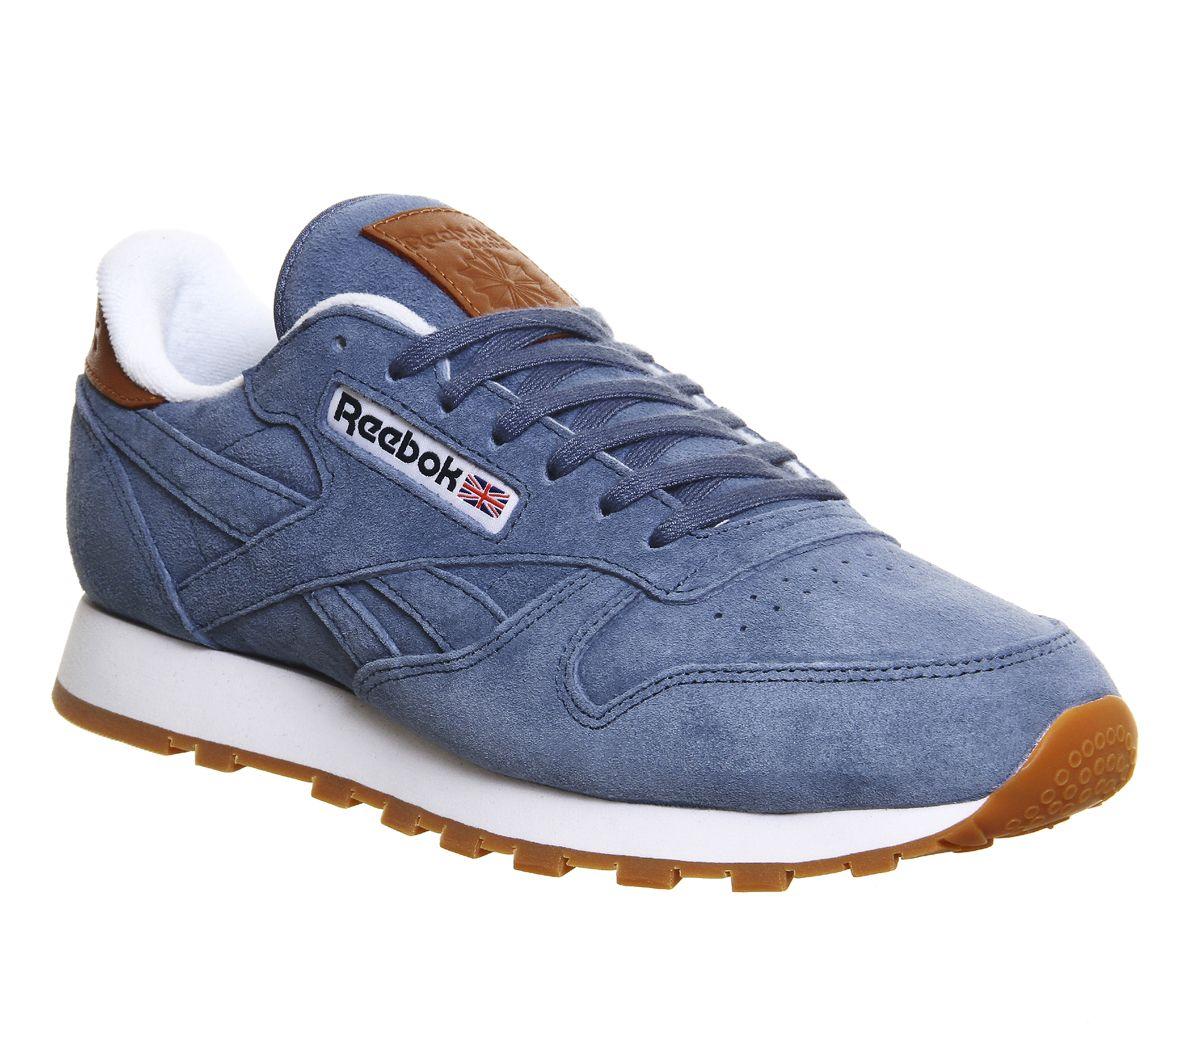 f418ee91de0 Reebok Cl Leather Blue Slate Collegiate Navy White Exclusive Sports  Footwear